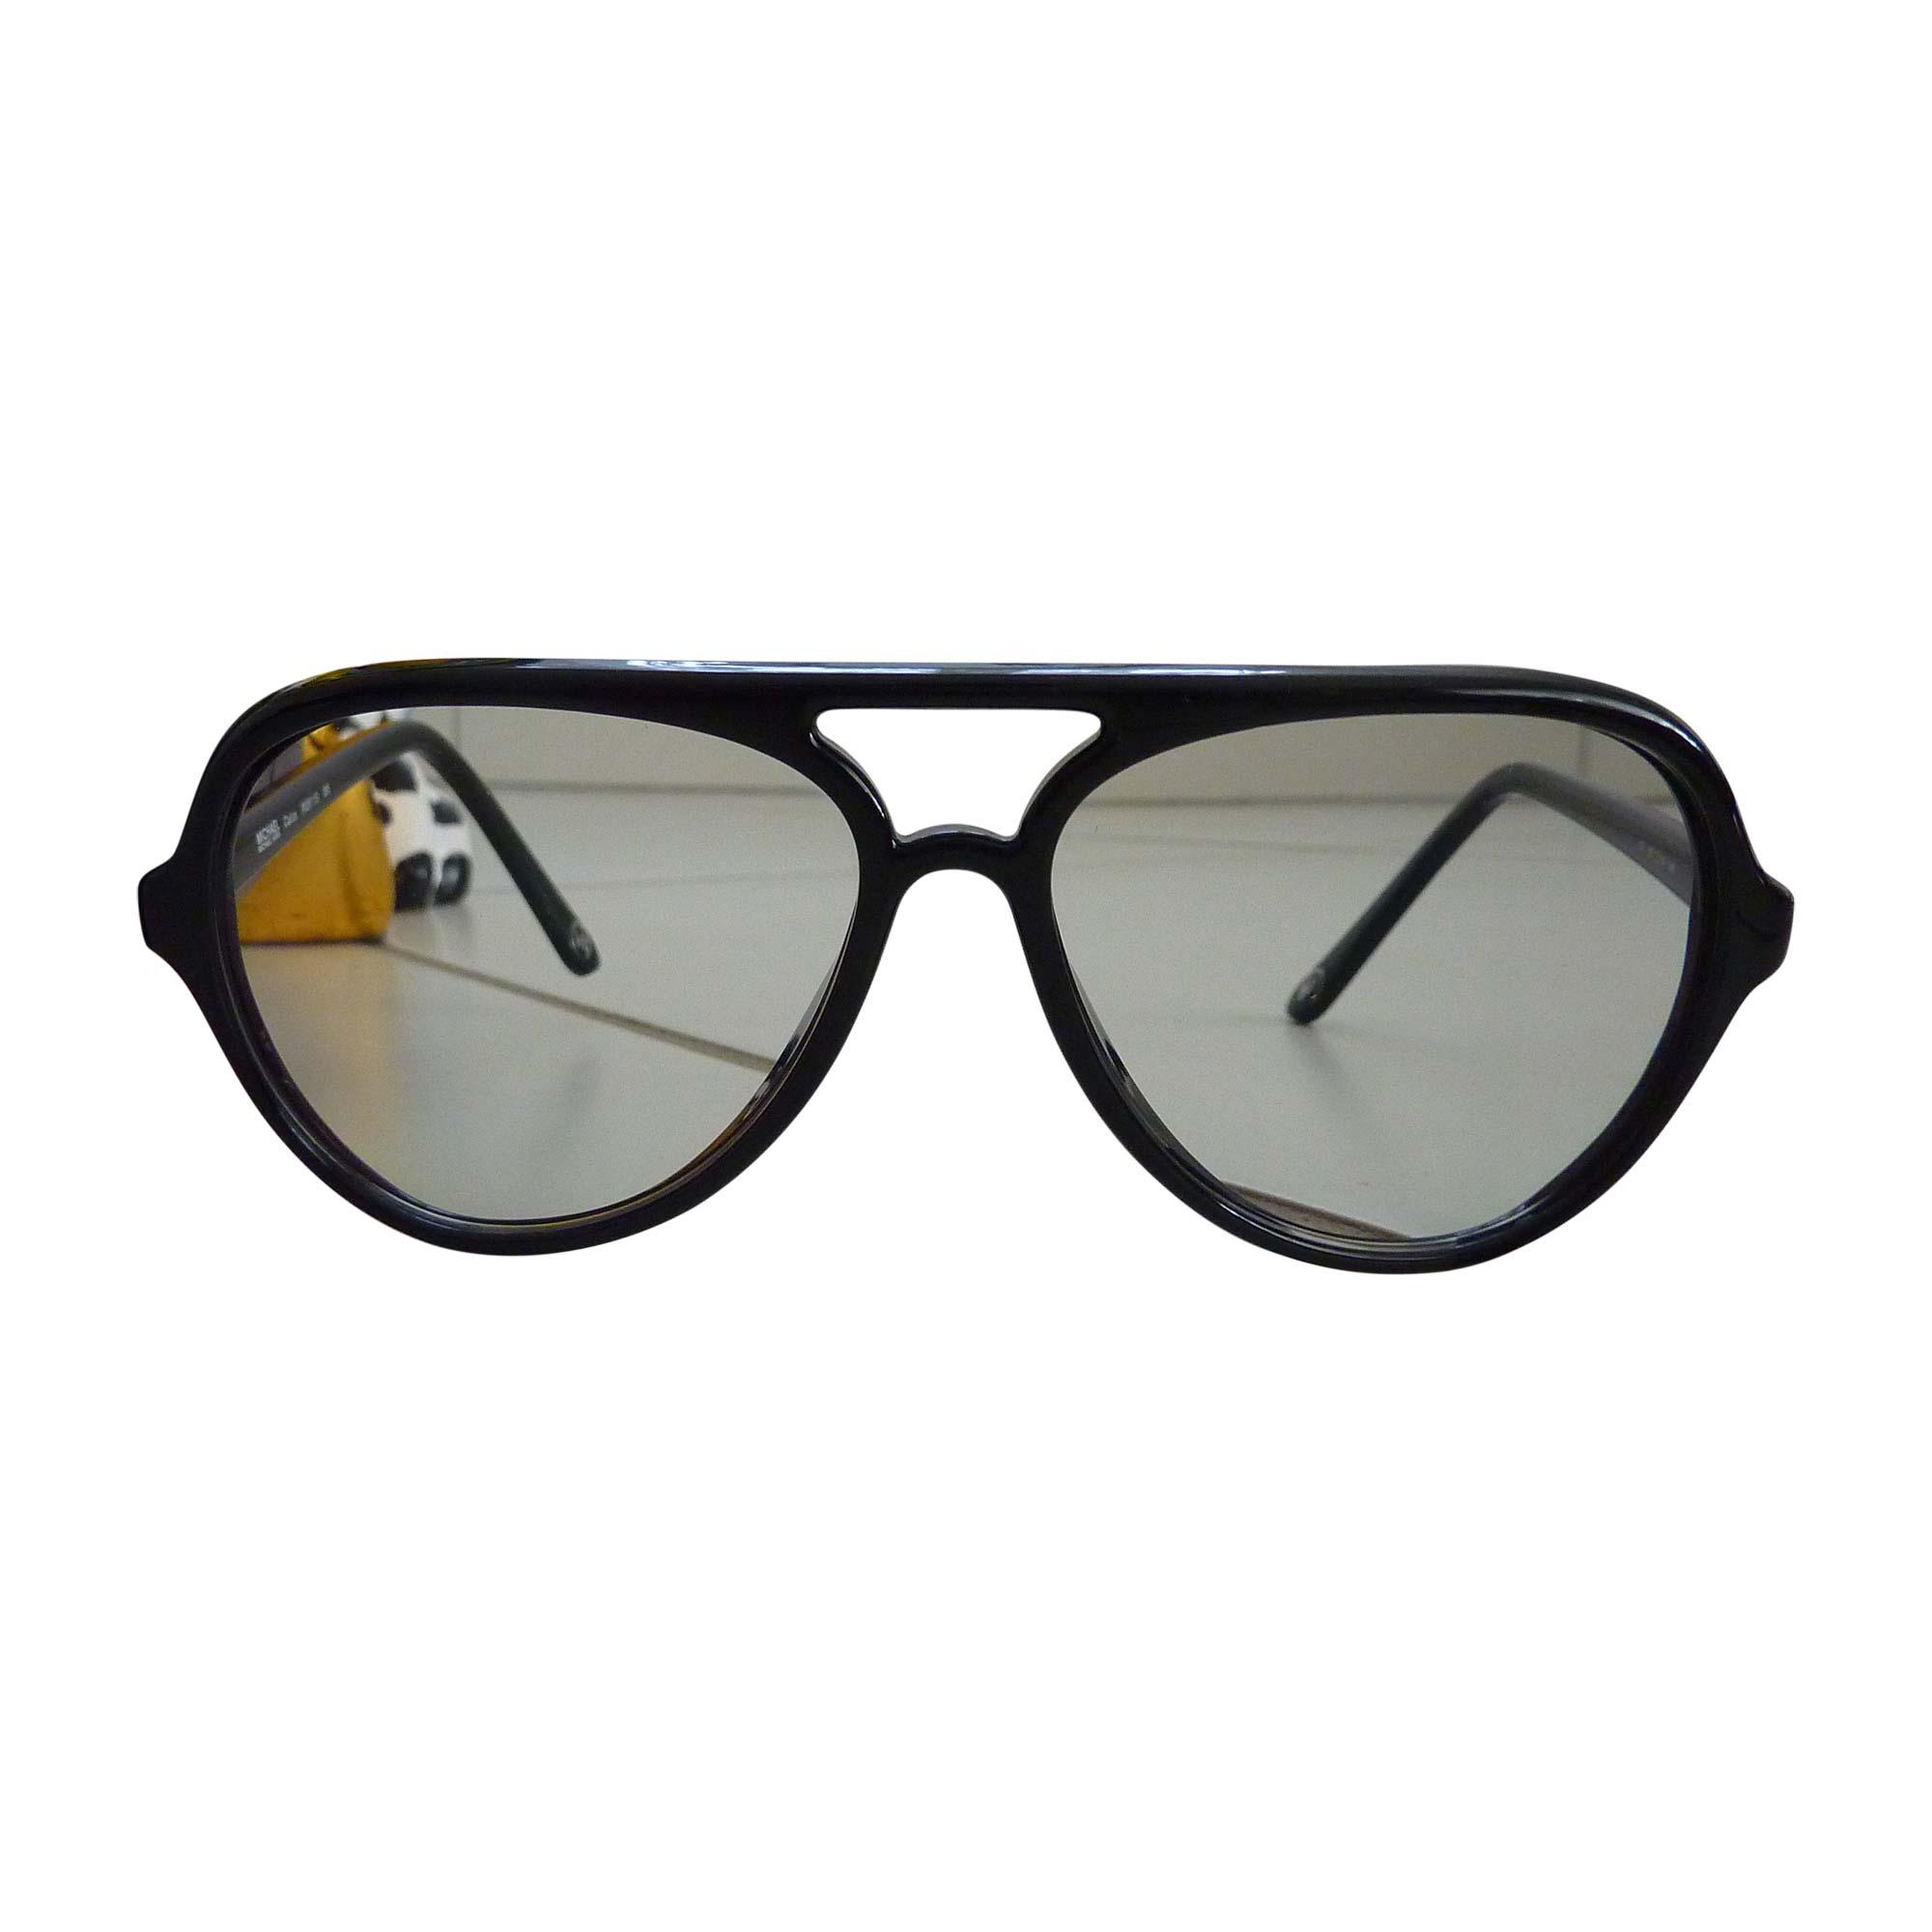 Eyeglass Frames MICHAEL KORS Black